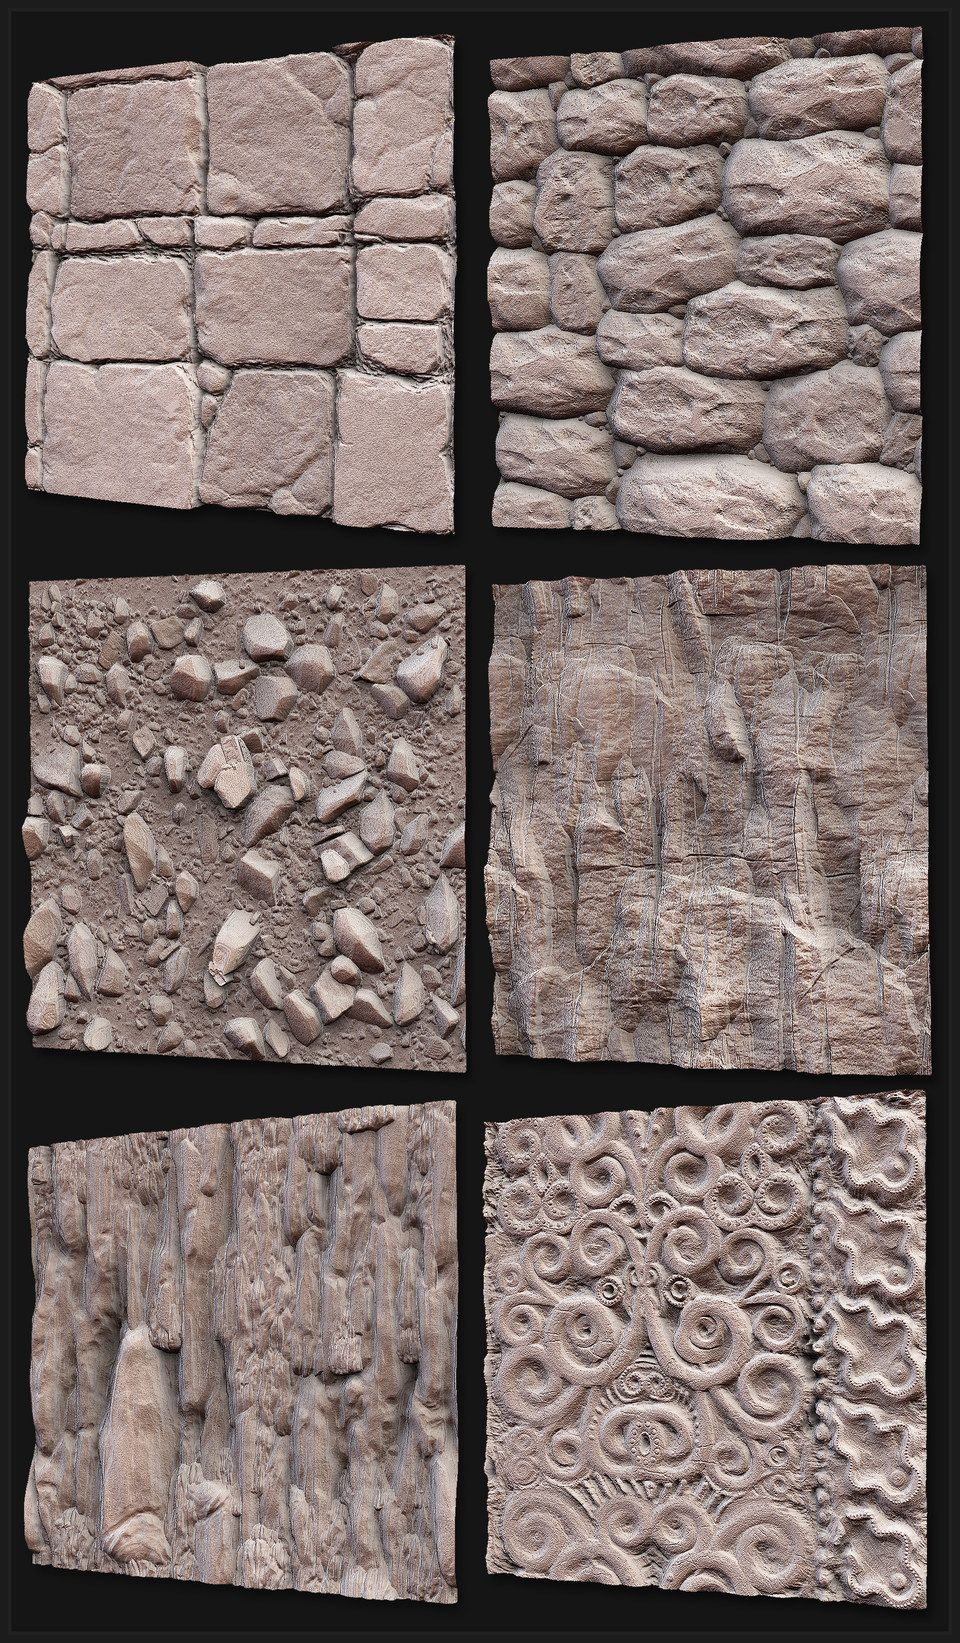 Wood Texture Zbrush Alpha - Exploring Mars